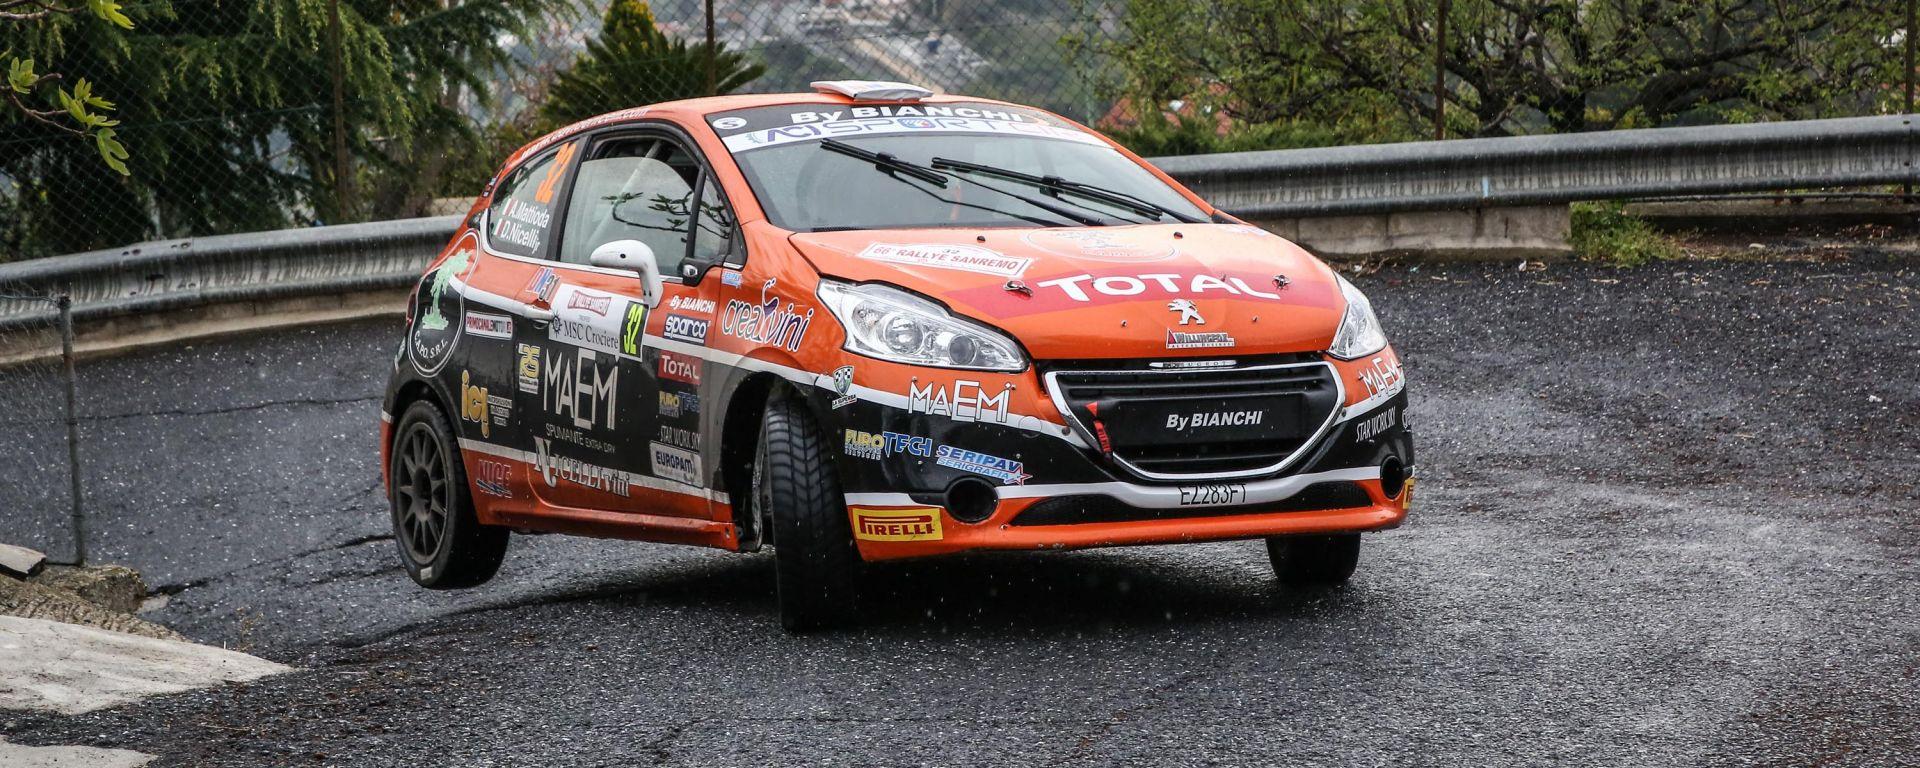 Nicelli - Peugeot 208R2b